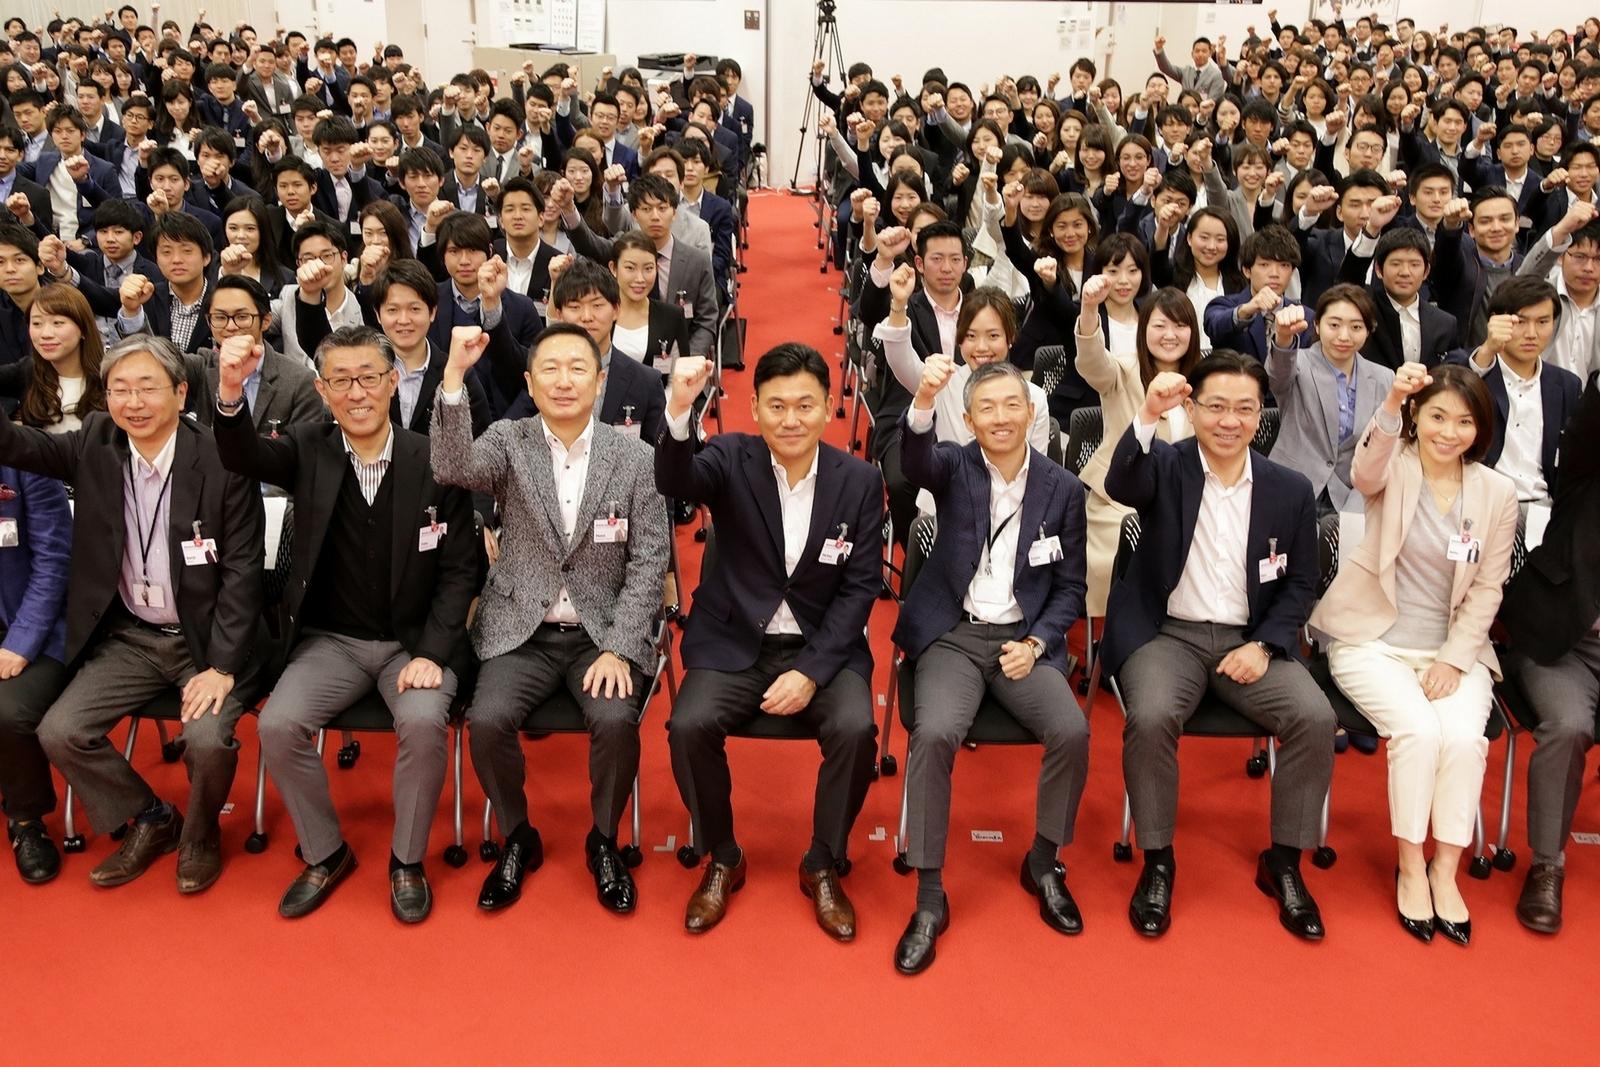 Rakuten welcomes over 300 fresh graduates in Tokyo